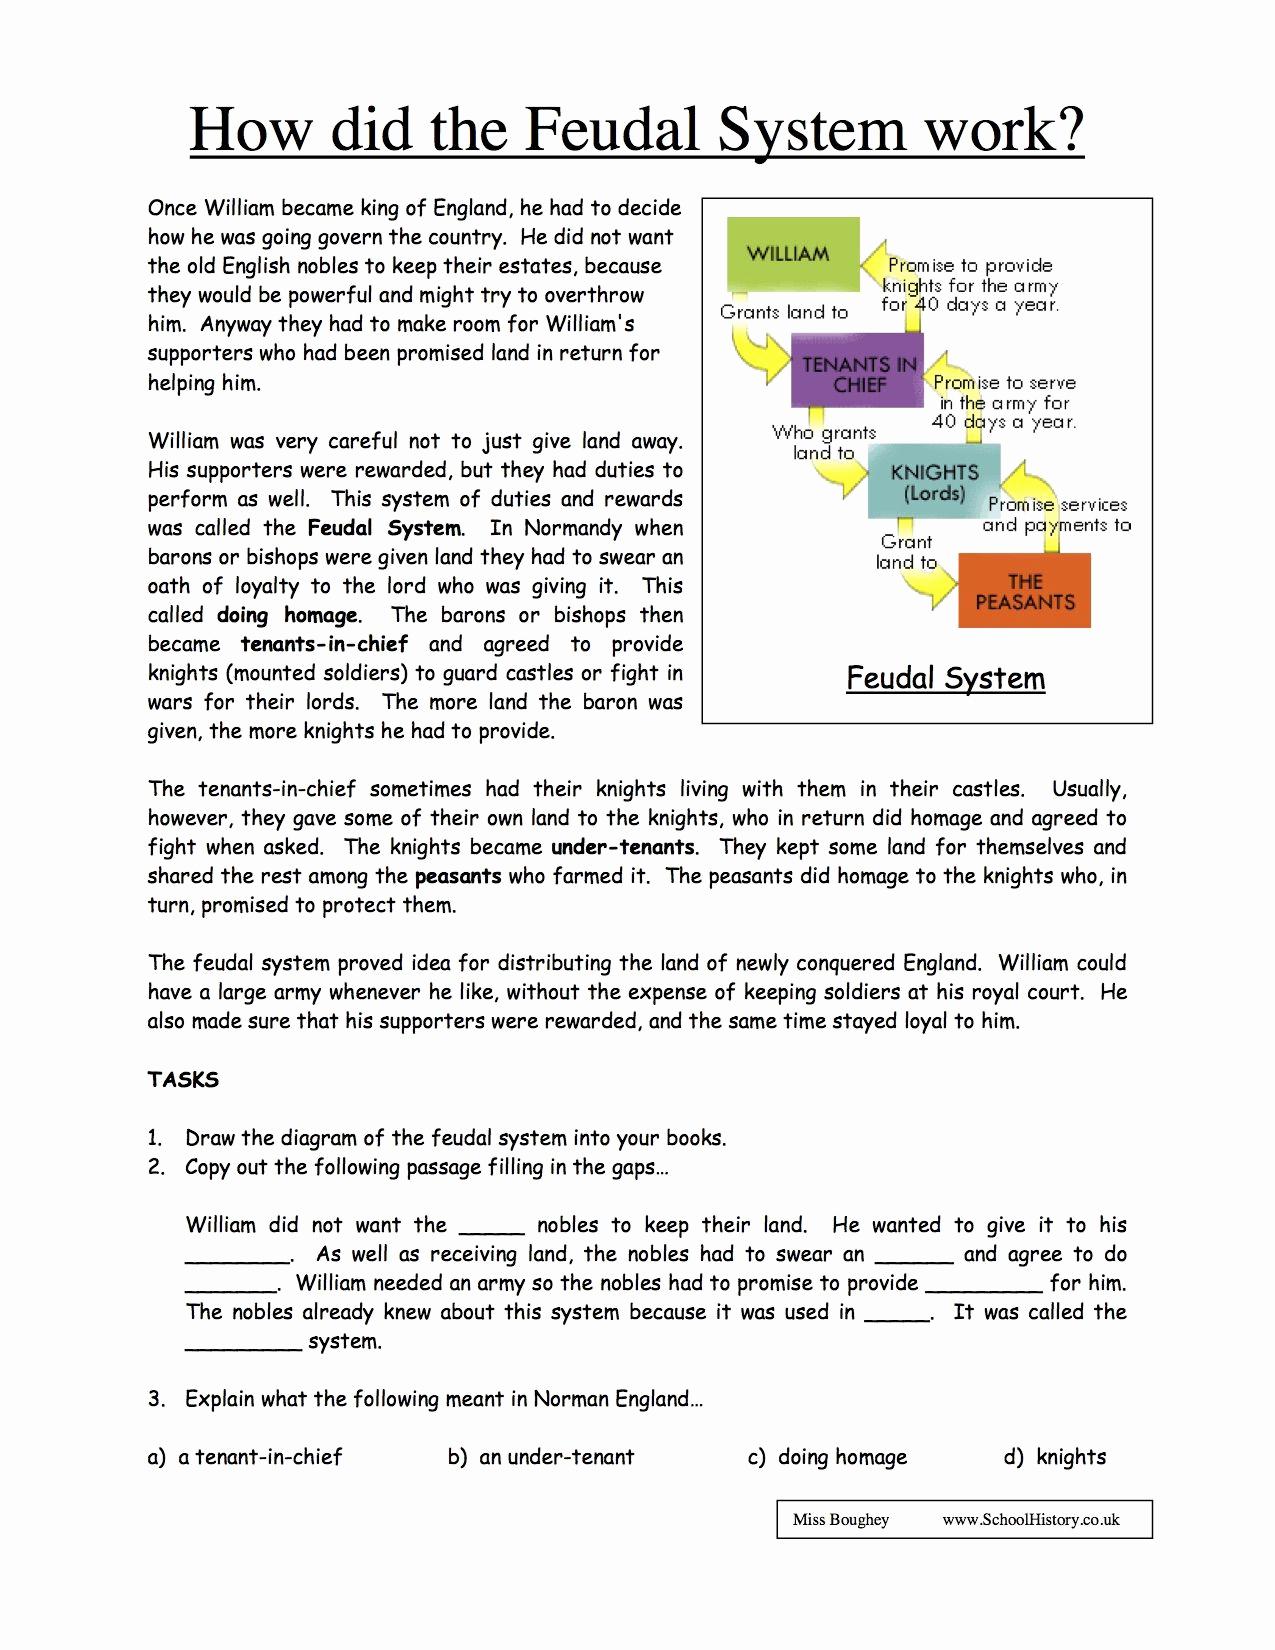 Free World History Worksheets Beautiful Free History Worksheets